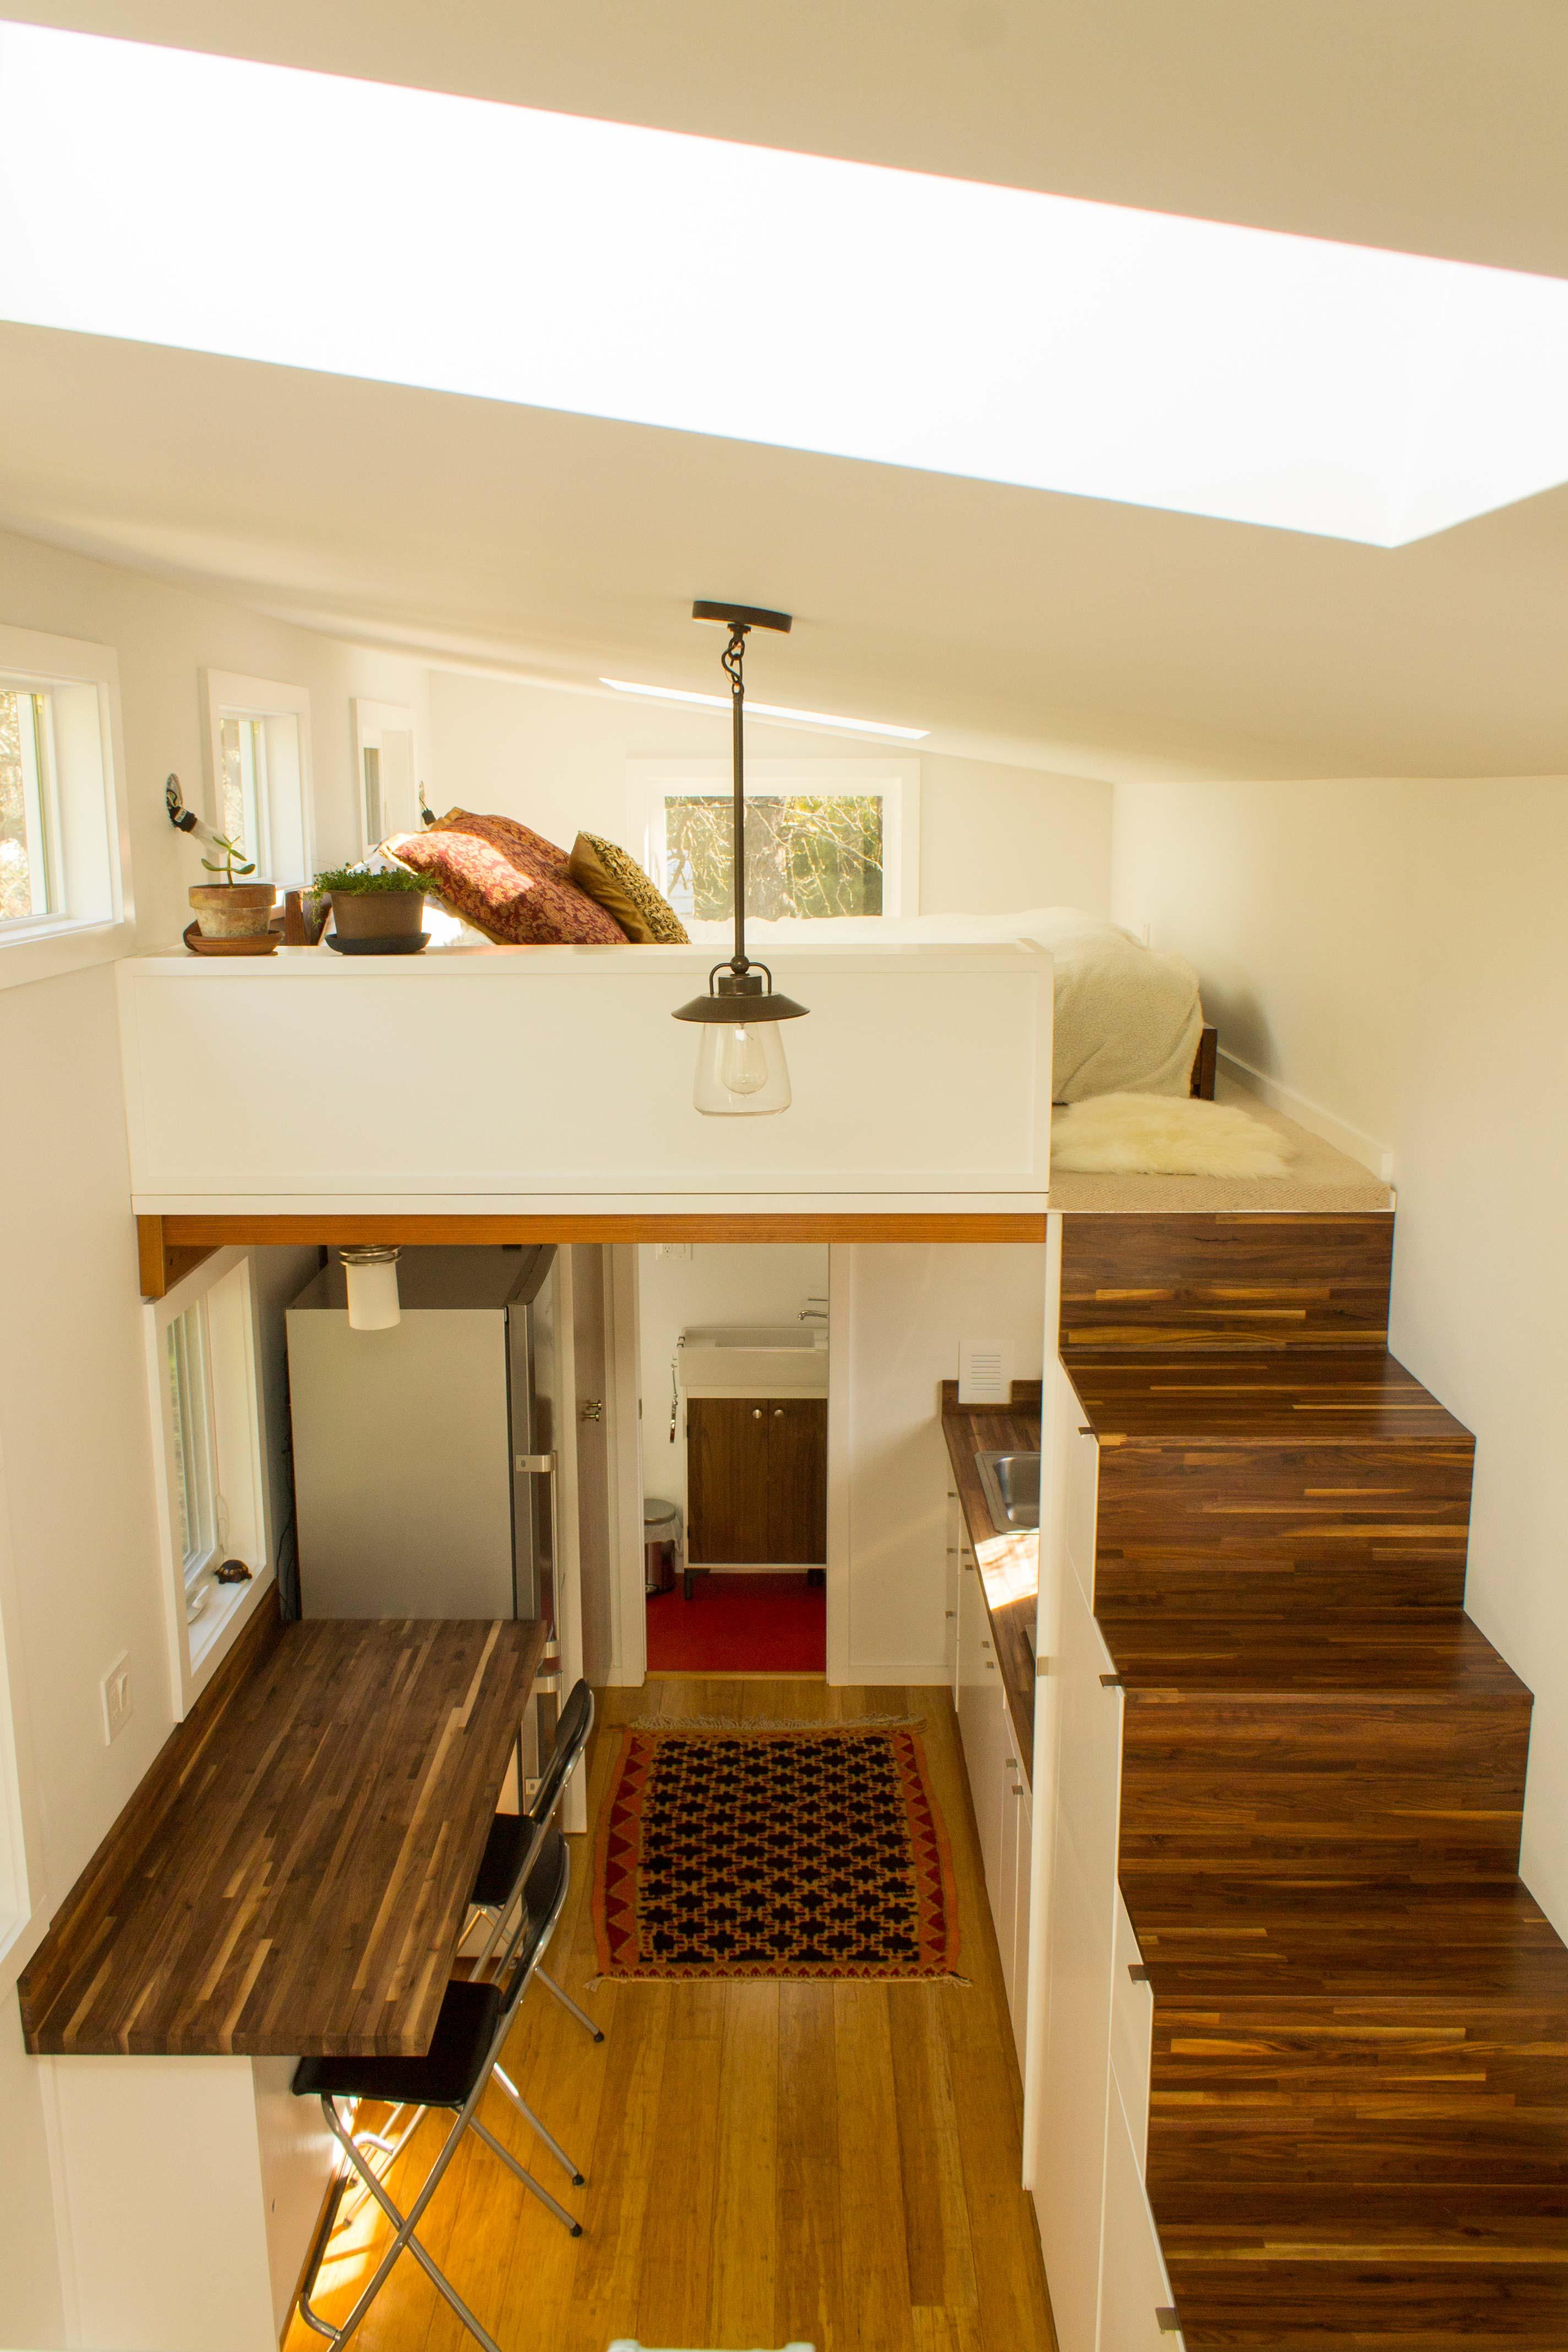 Best Kitchen Gallery: The Hikari Box Tiny House Plans Padtinyhouses of Efficient Home Loft Design on rachelxblog.com